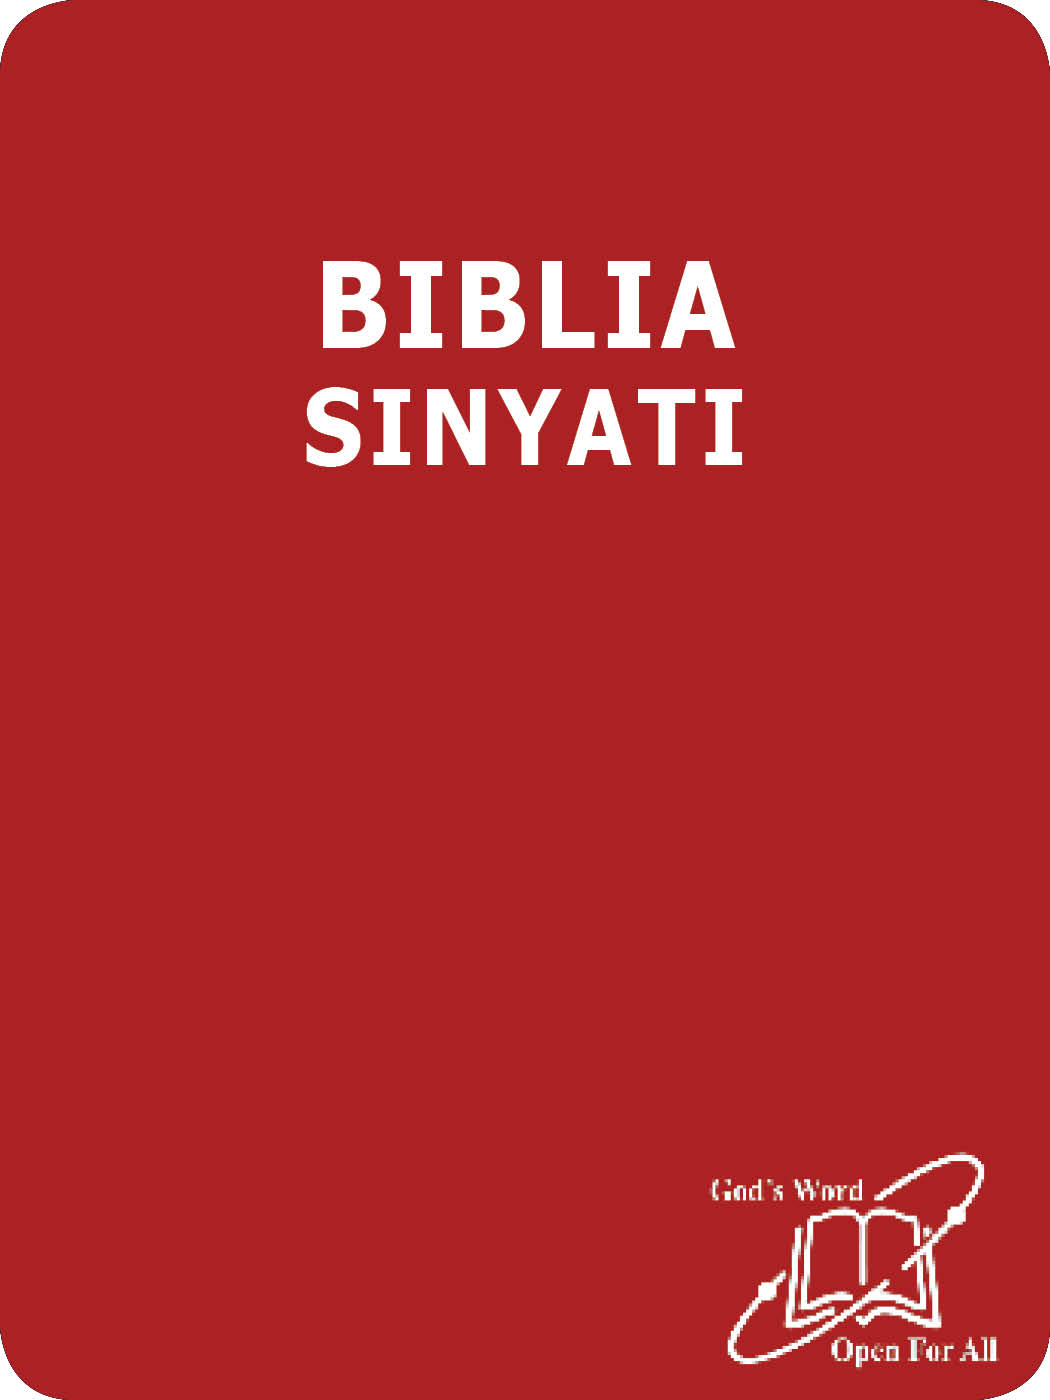 BIBLIA SINYATI TE NKUTUK OO LMAASAI NATISIRAKI ENG'EJUK NAATA MBUKUI E DITROKANONI